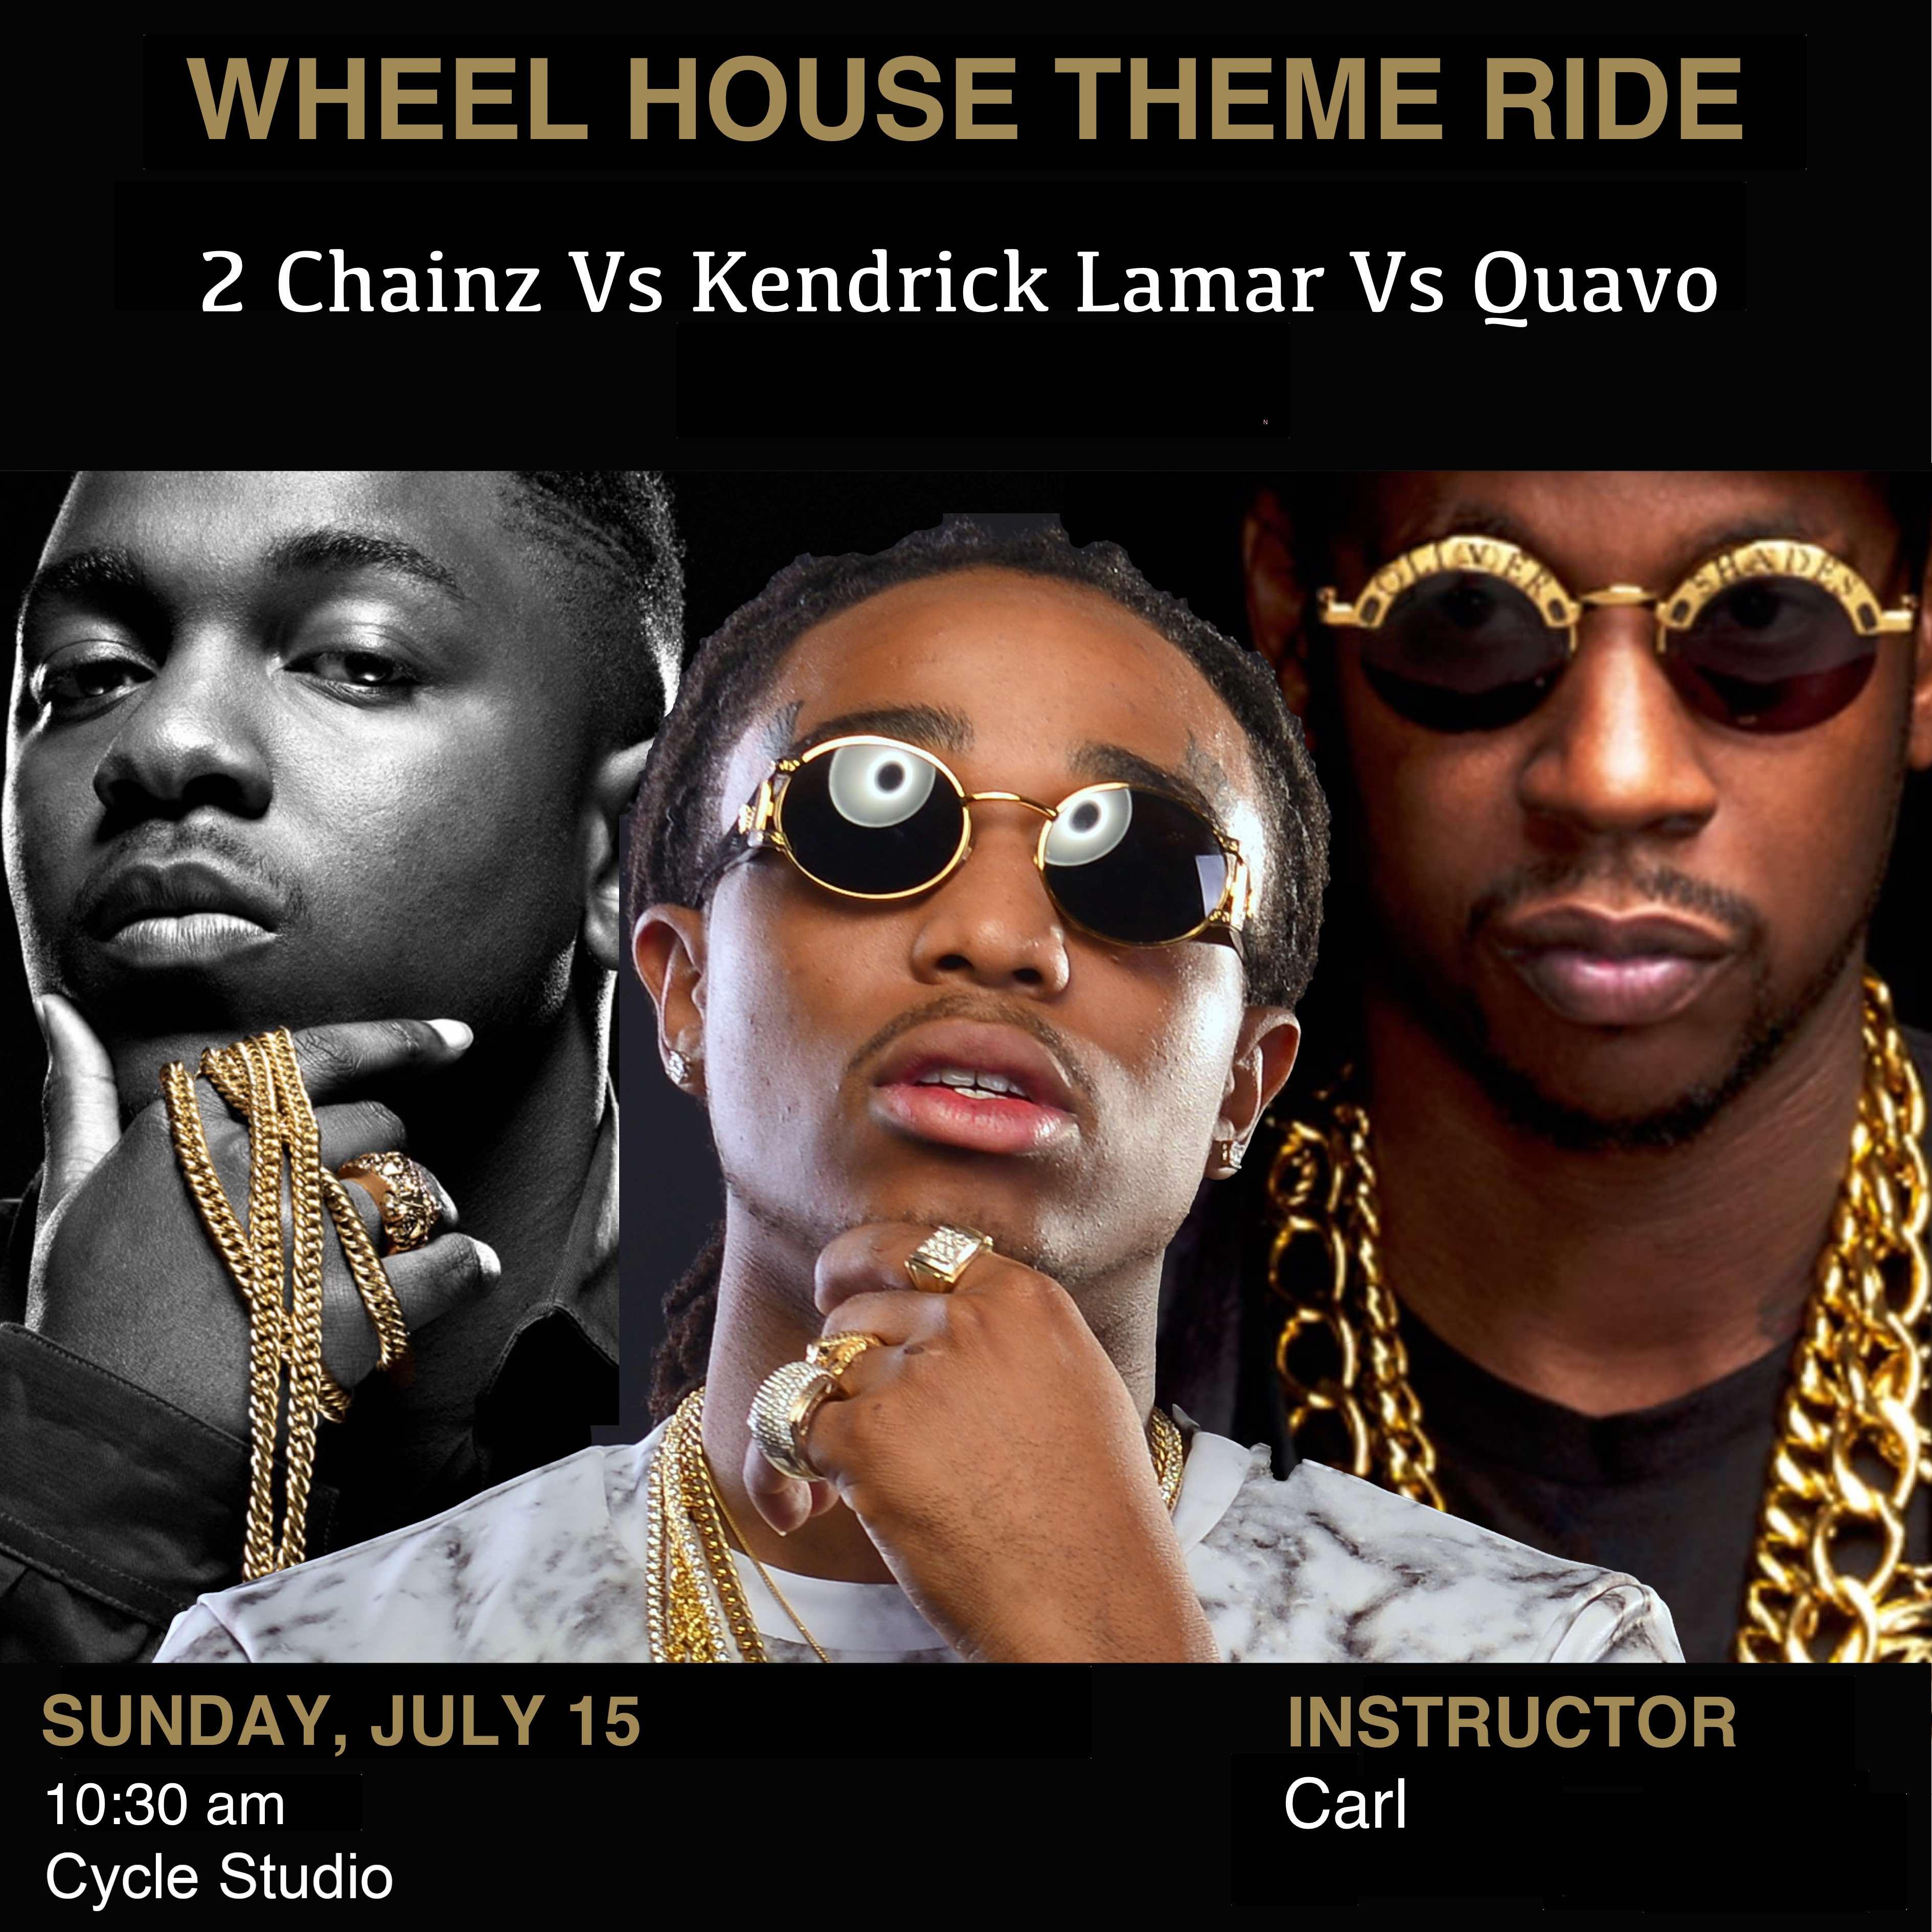 2 Chainz vs Kendrick Lamar vs Quavo